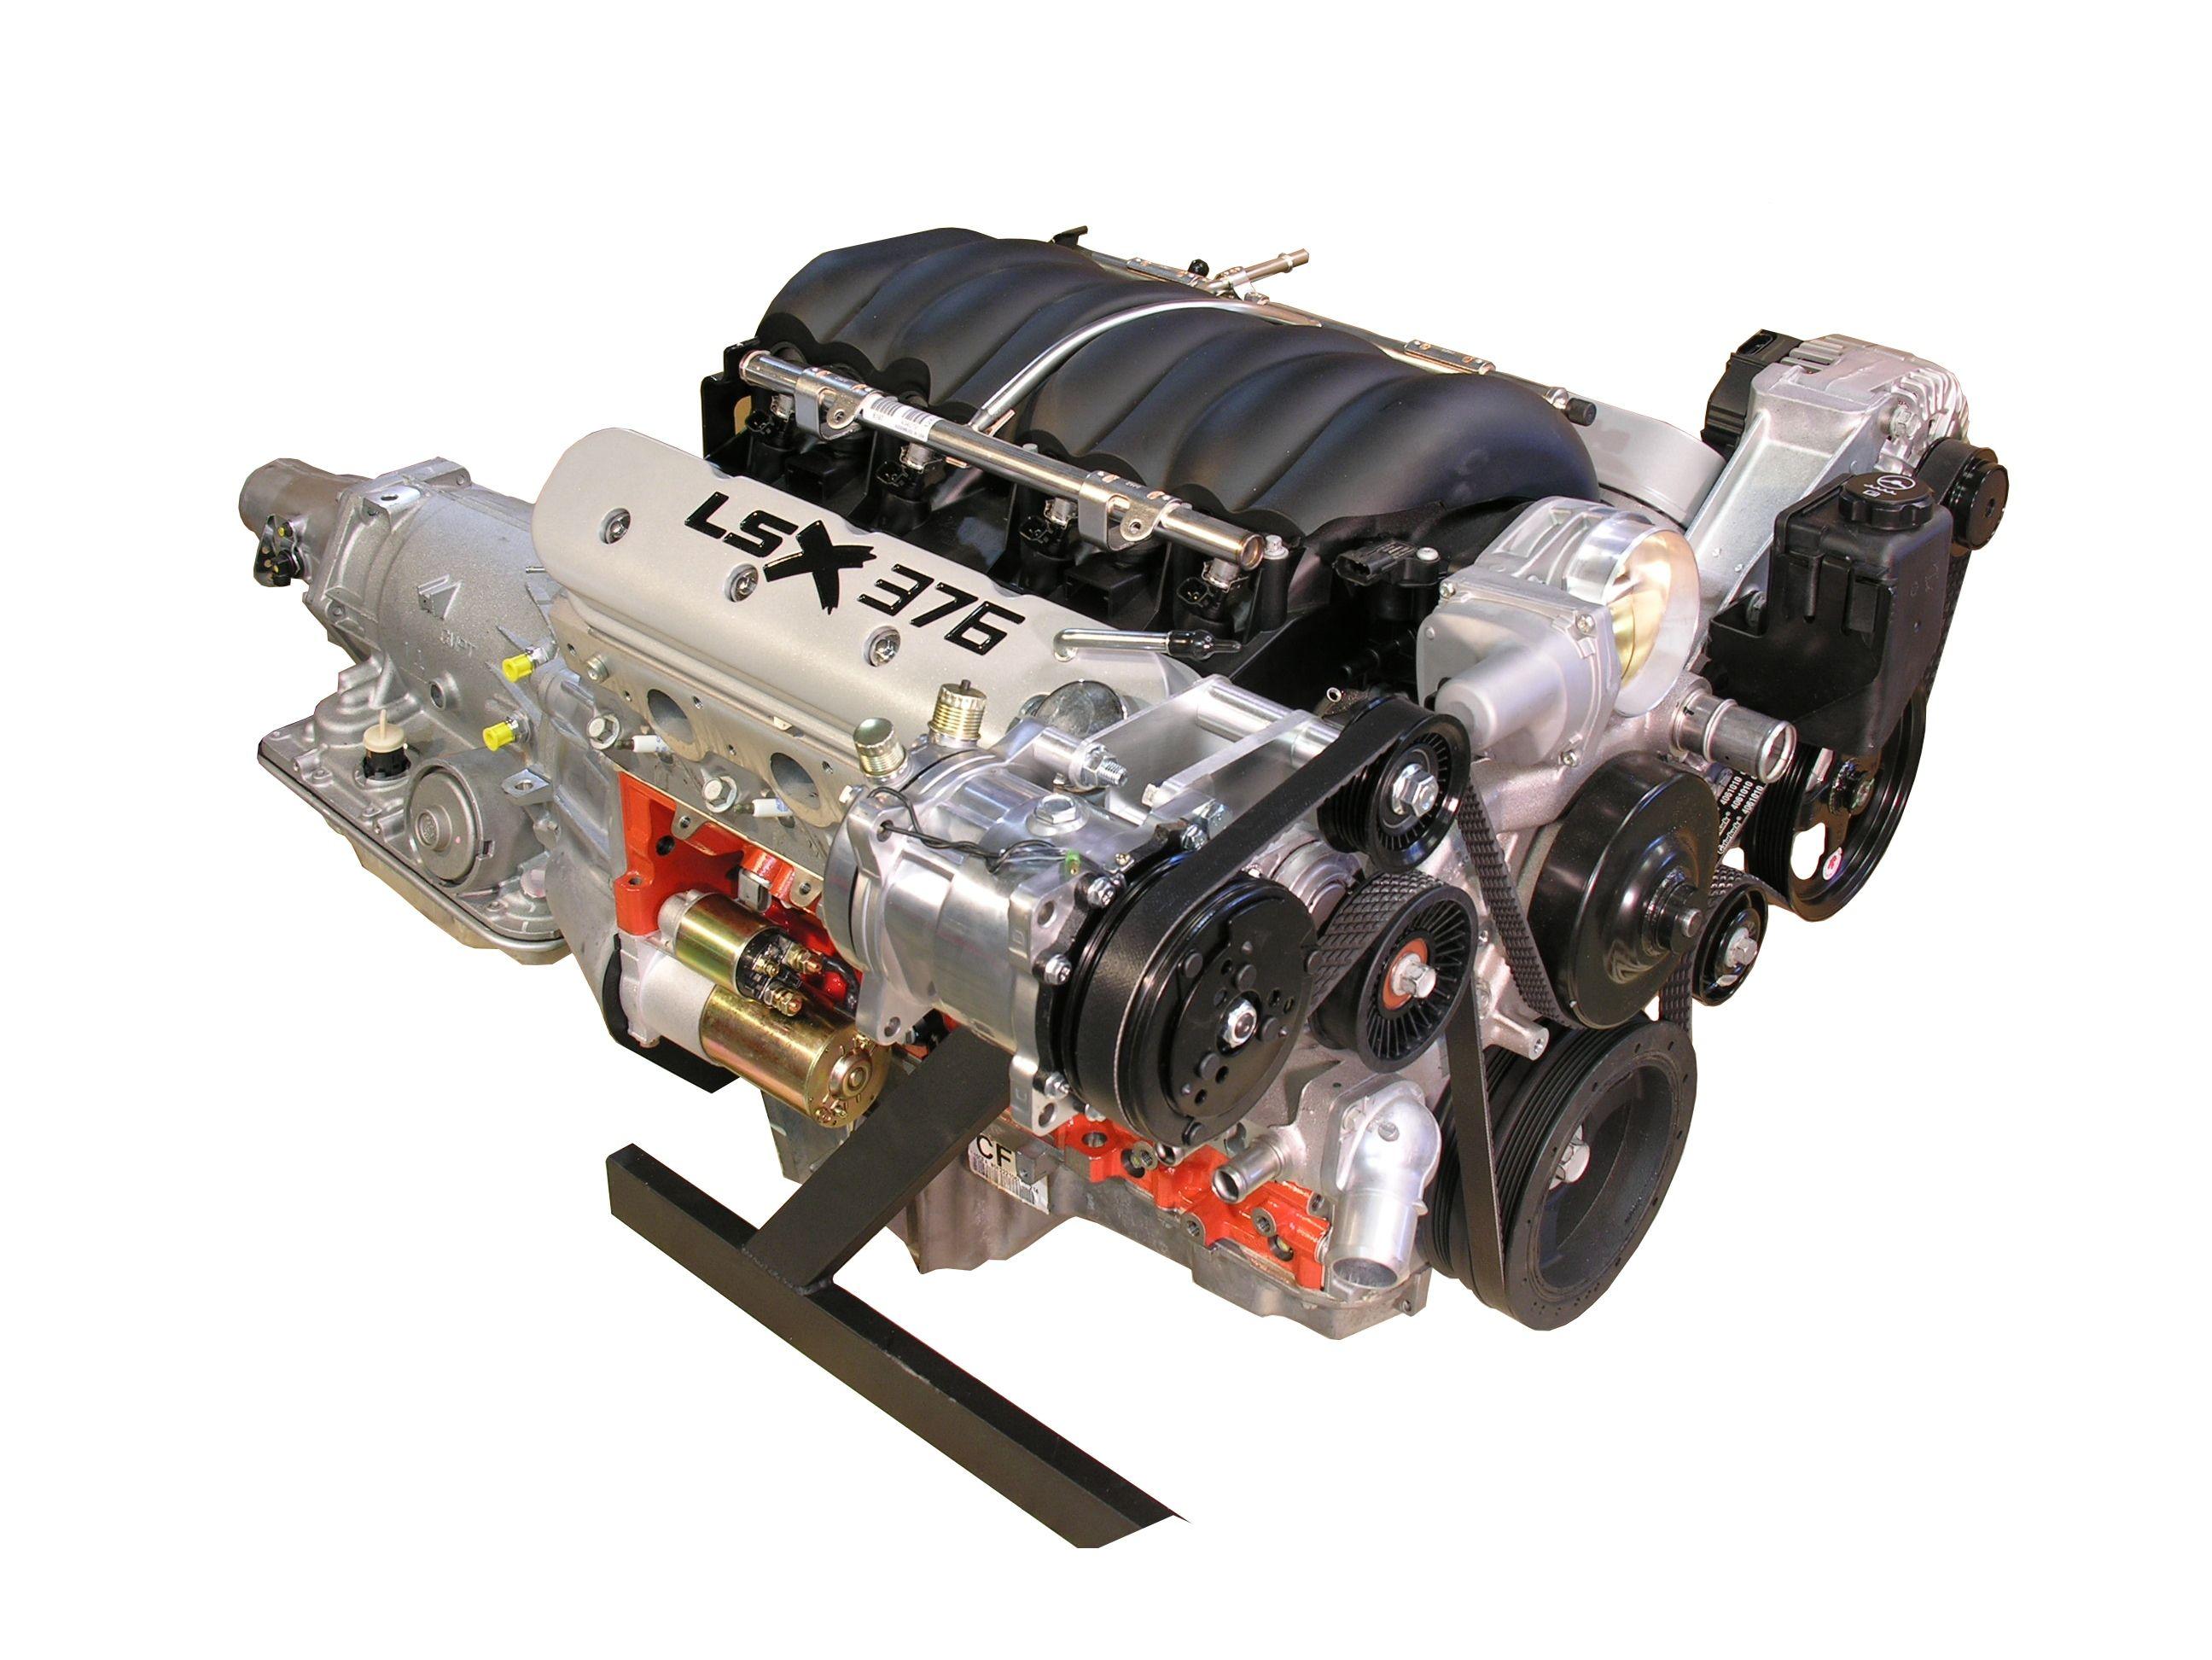 LSx 376 Engine with 4L70E Transmission - 600 HP - spsengines com